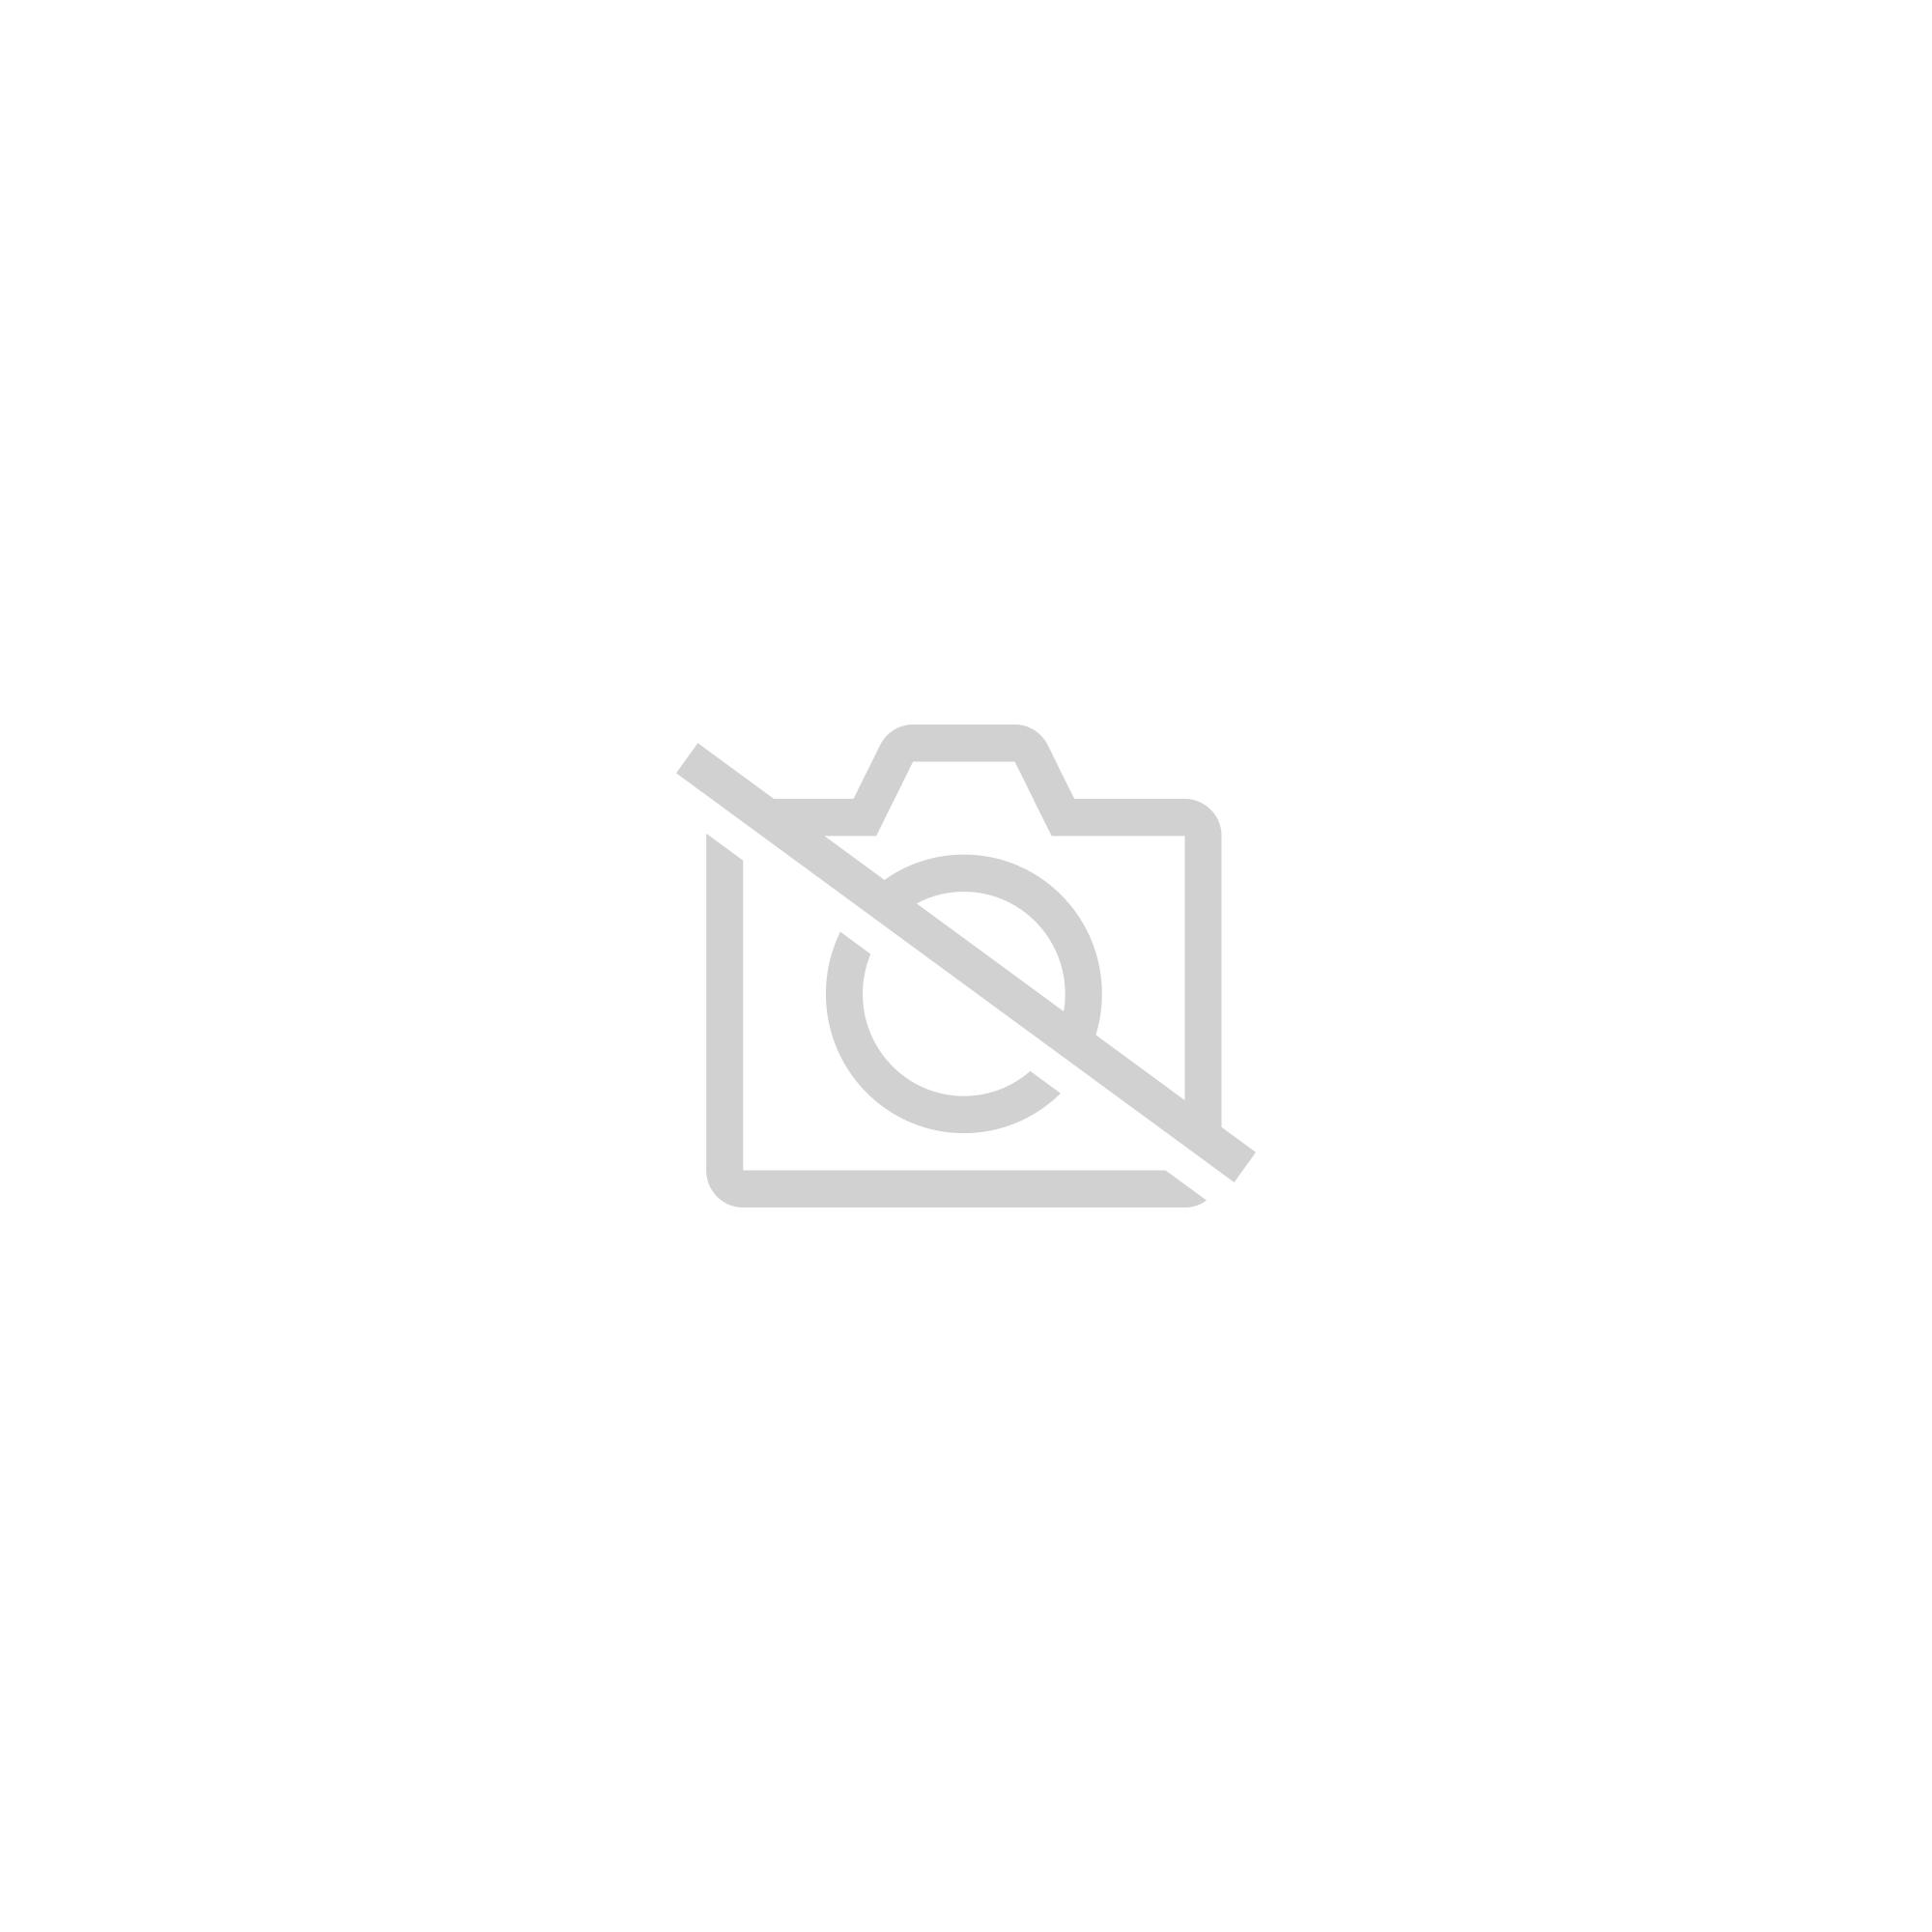 Vhbw Li-Polymer Batterie 2200mah (3.8v) Pour T?L?Phone Portable, Smartphone Motorola Moto Xt1079, Xt1526, Xt1528comme Et40, Ft40, Snn5956a.